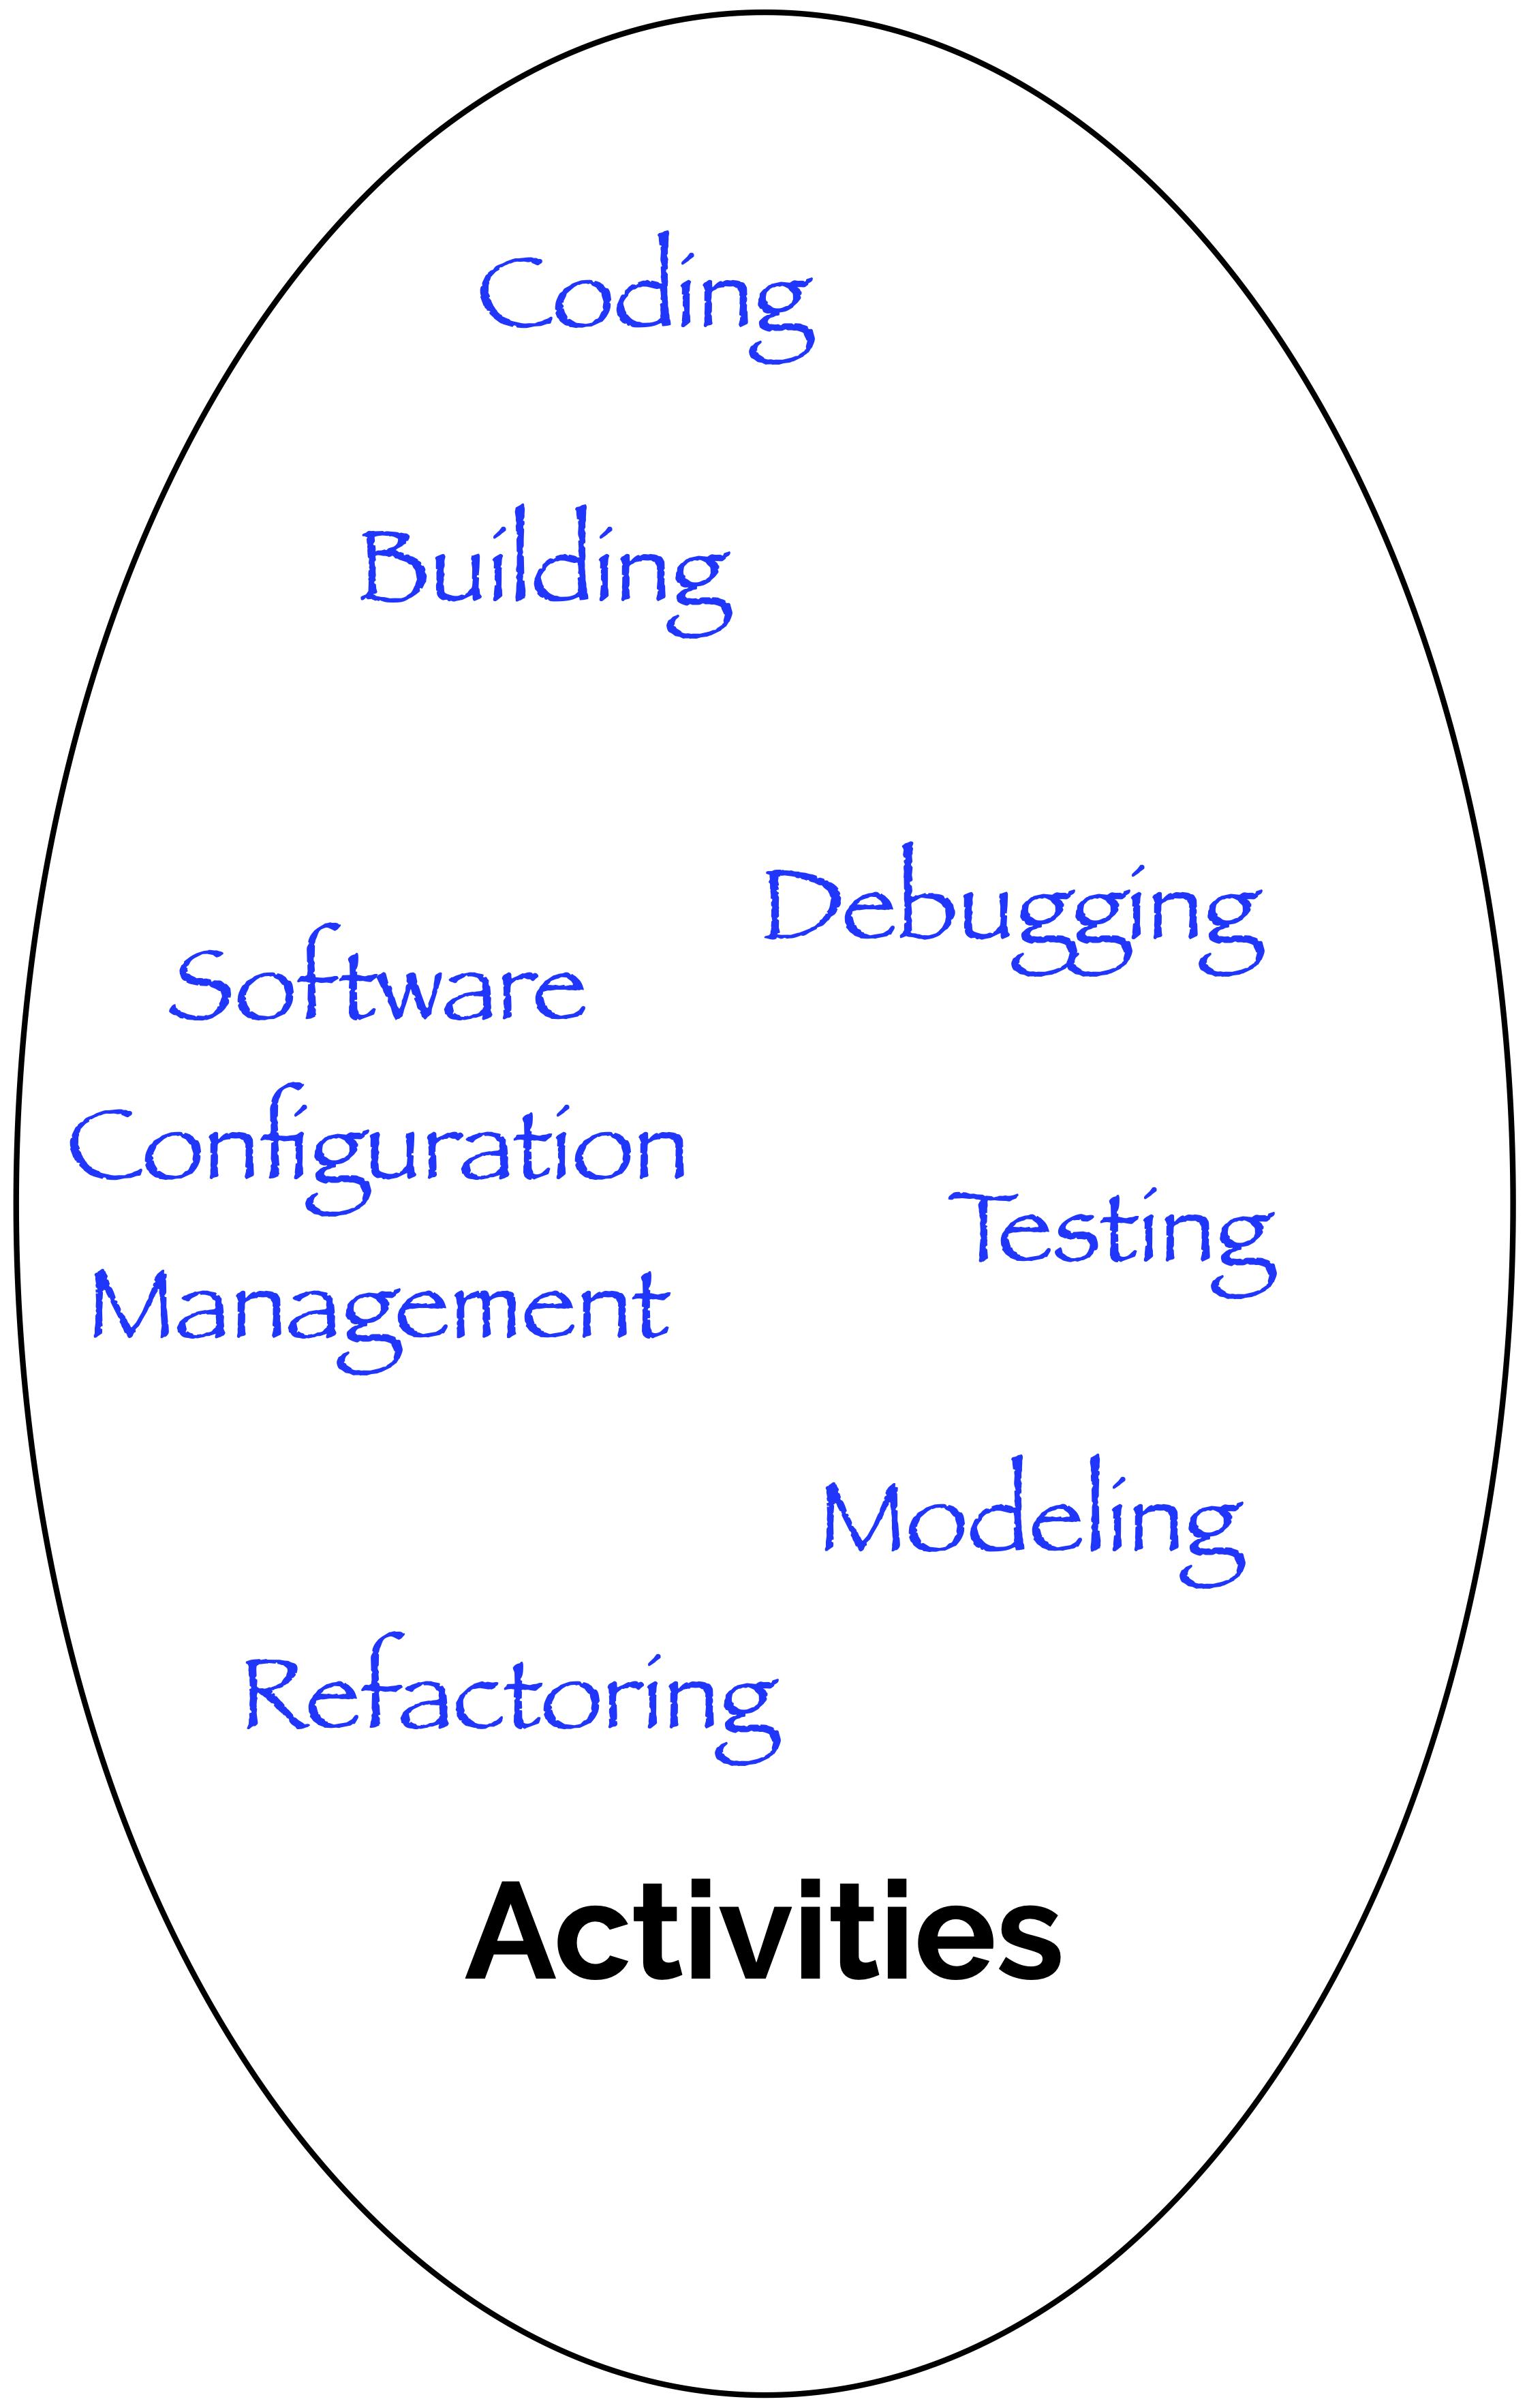 src/images/big-picture-activities.png